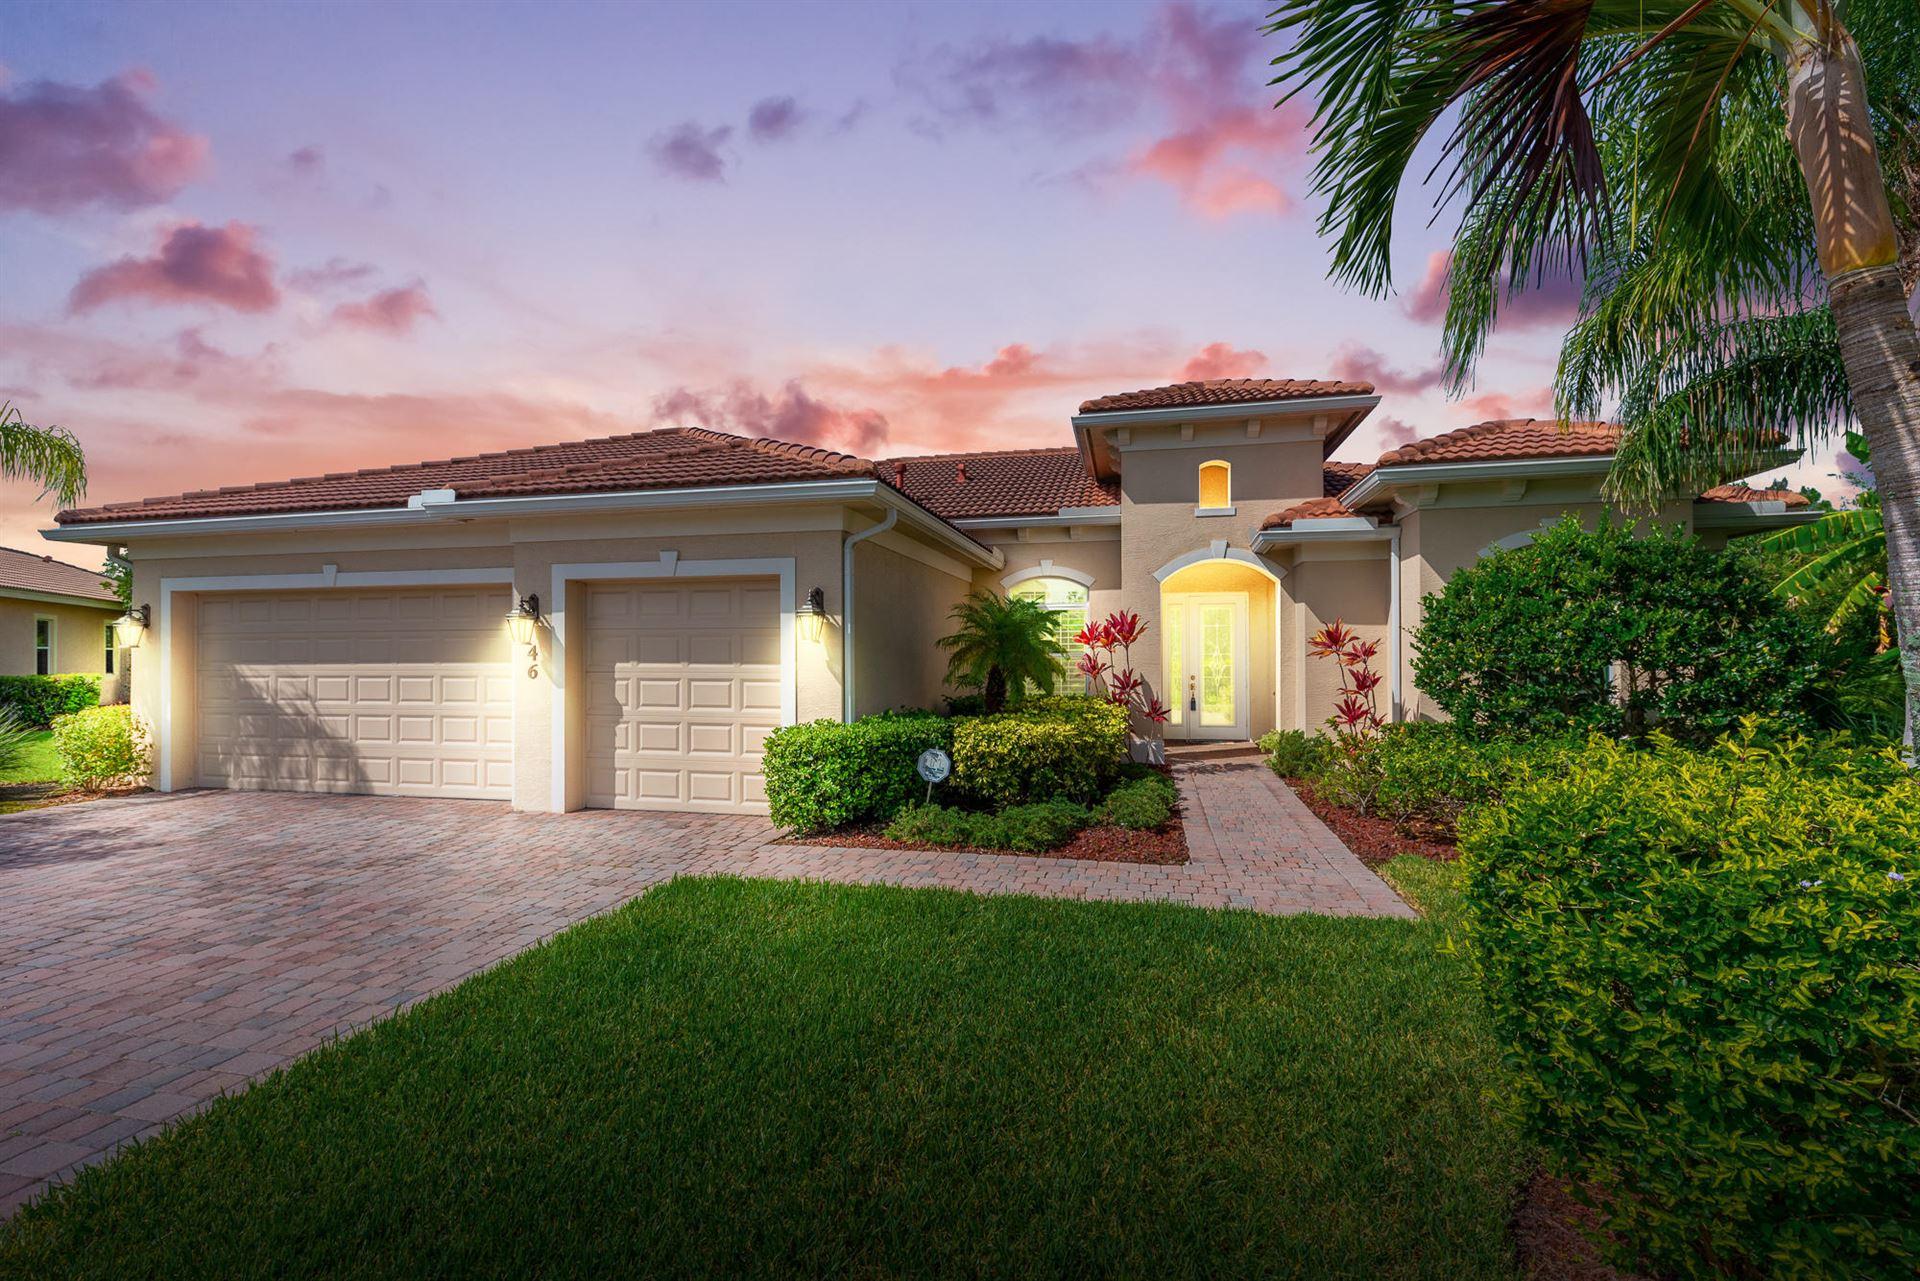 46 SE Ethan Terrace, Stuart, FL 34997 - #: RX-10632703